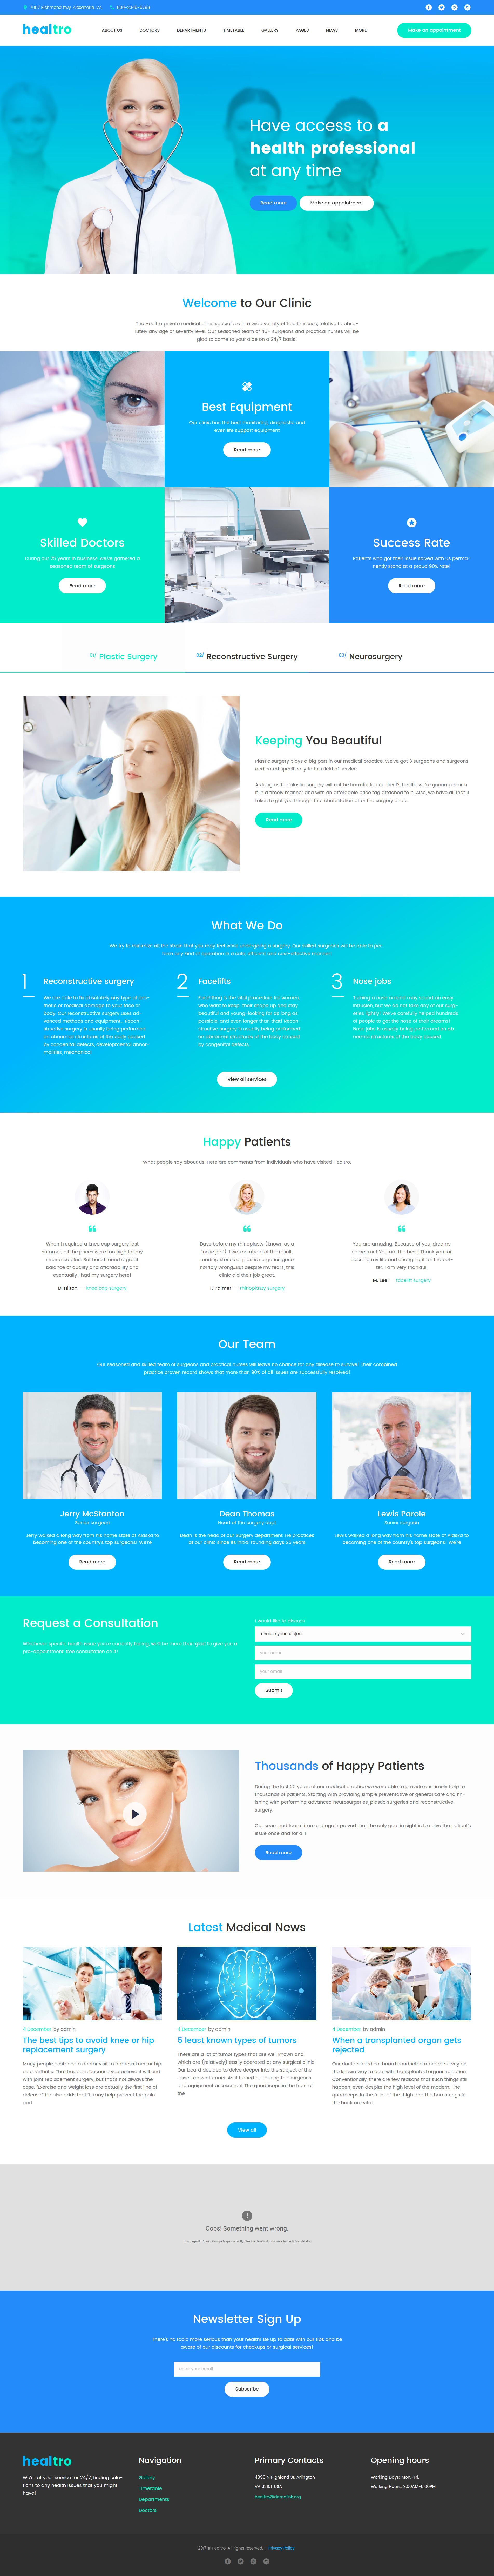 Шаблон Healtro для сайта медицинского центра #58677